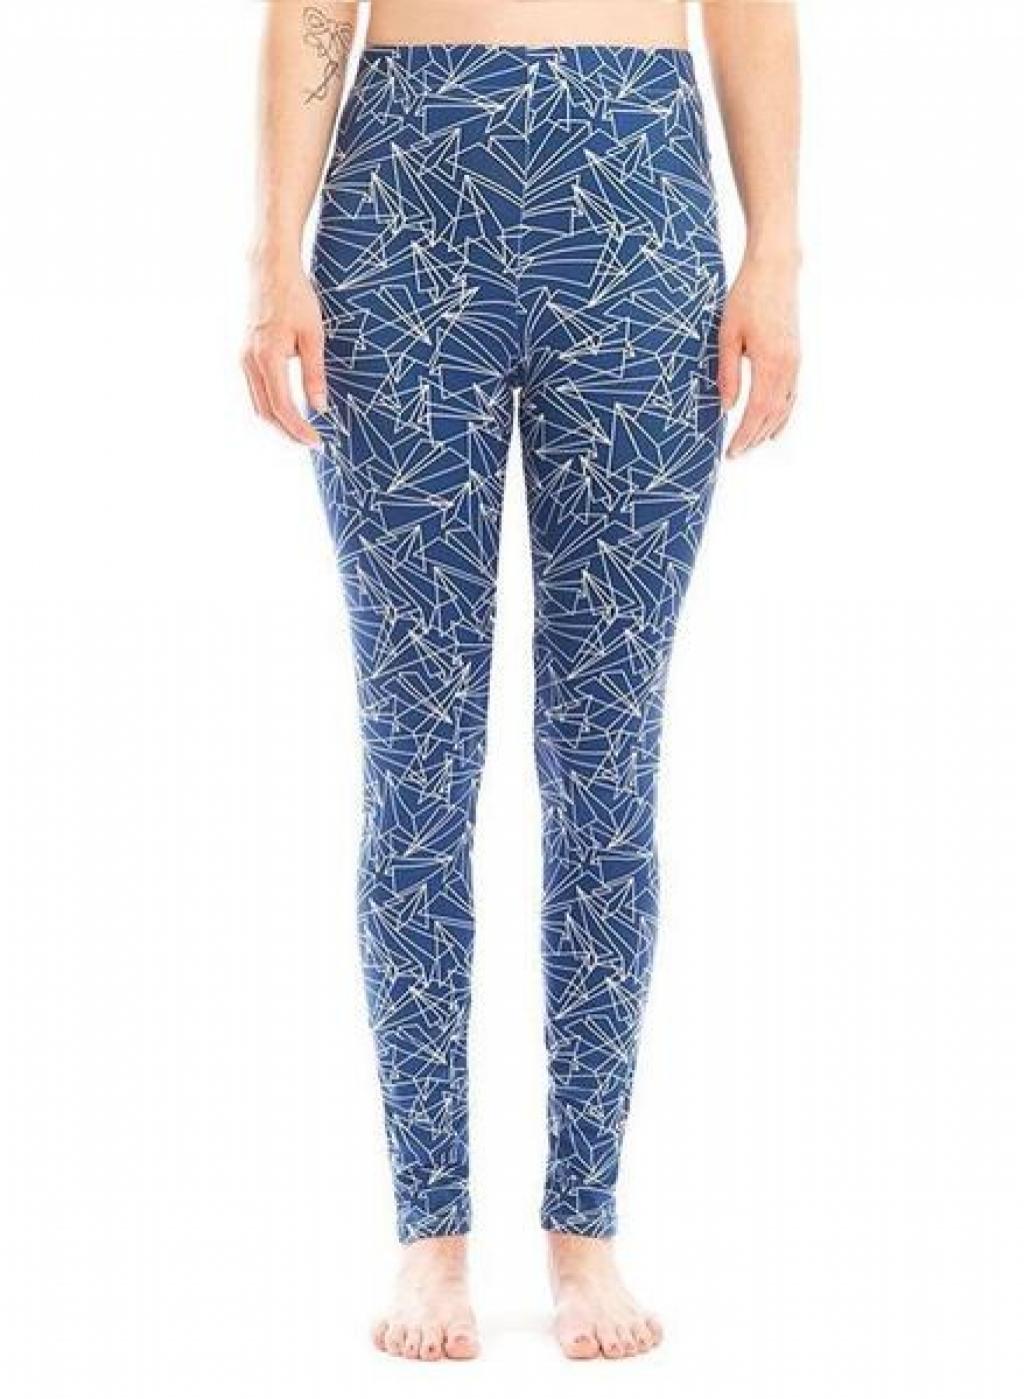 15429805100_liz-m-leggings-paper-plane-leggings-3809159741528_grande.jpg